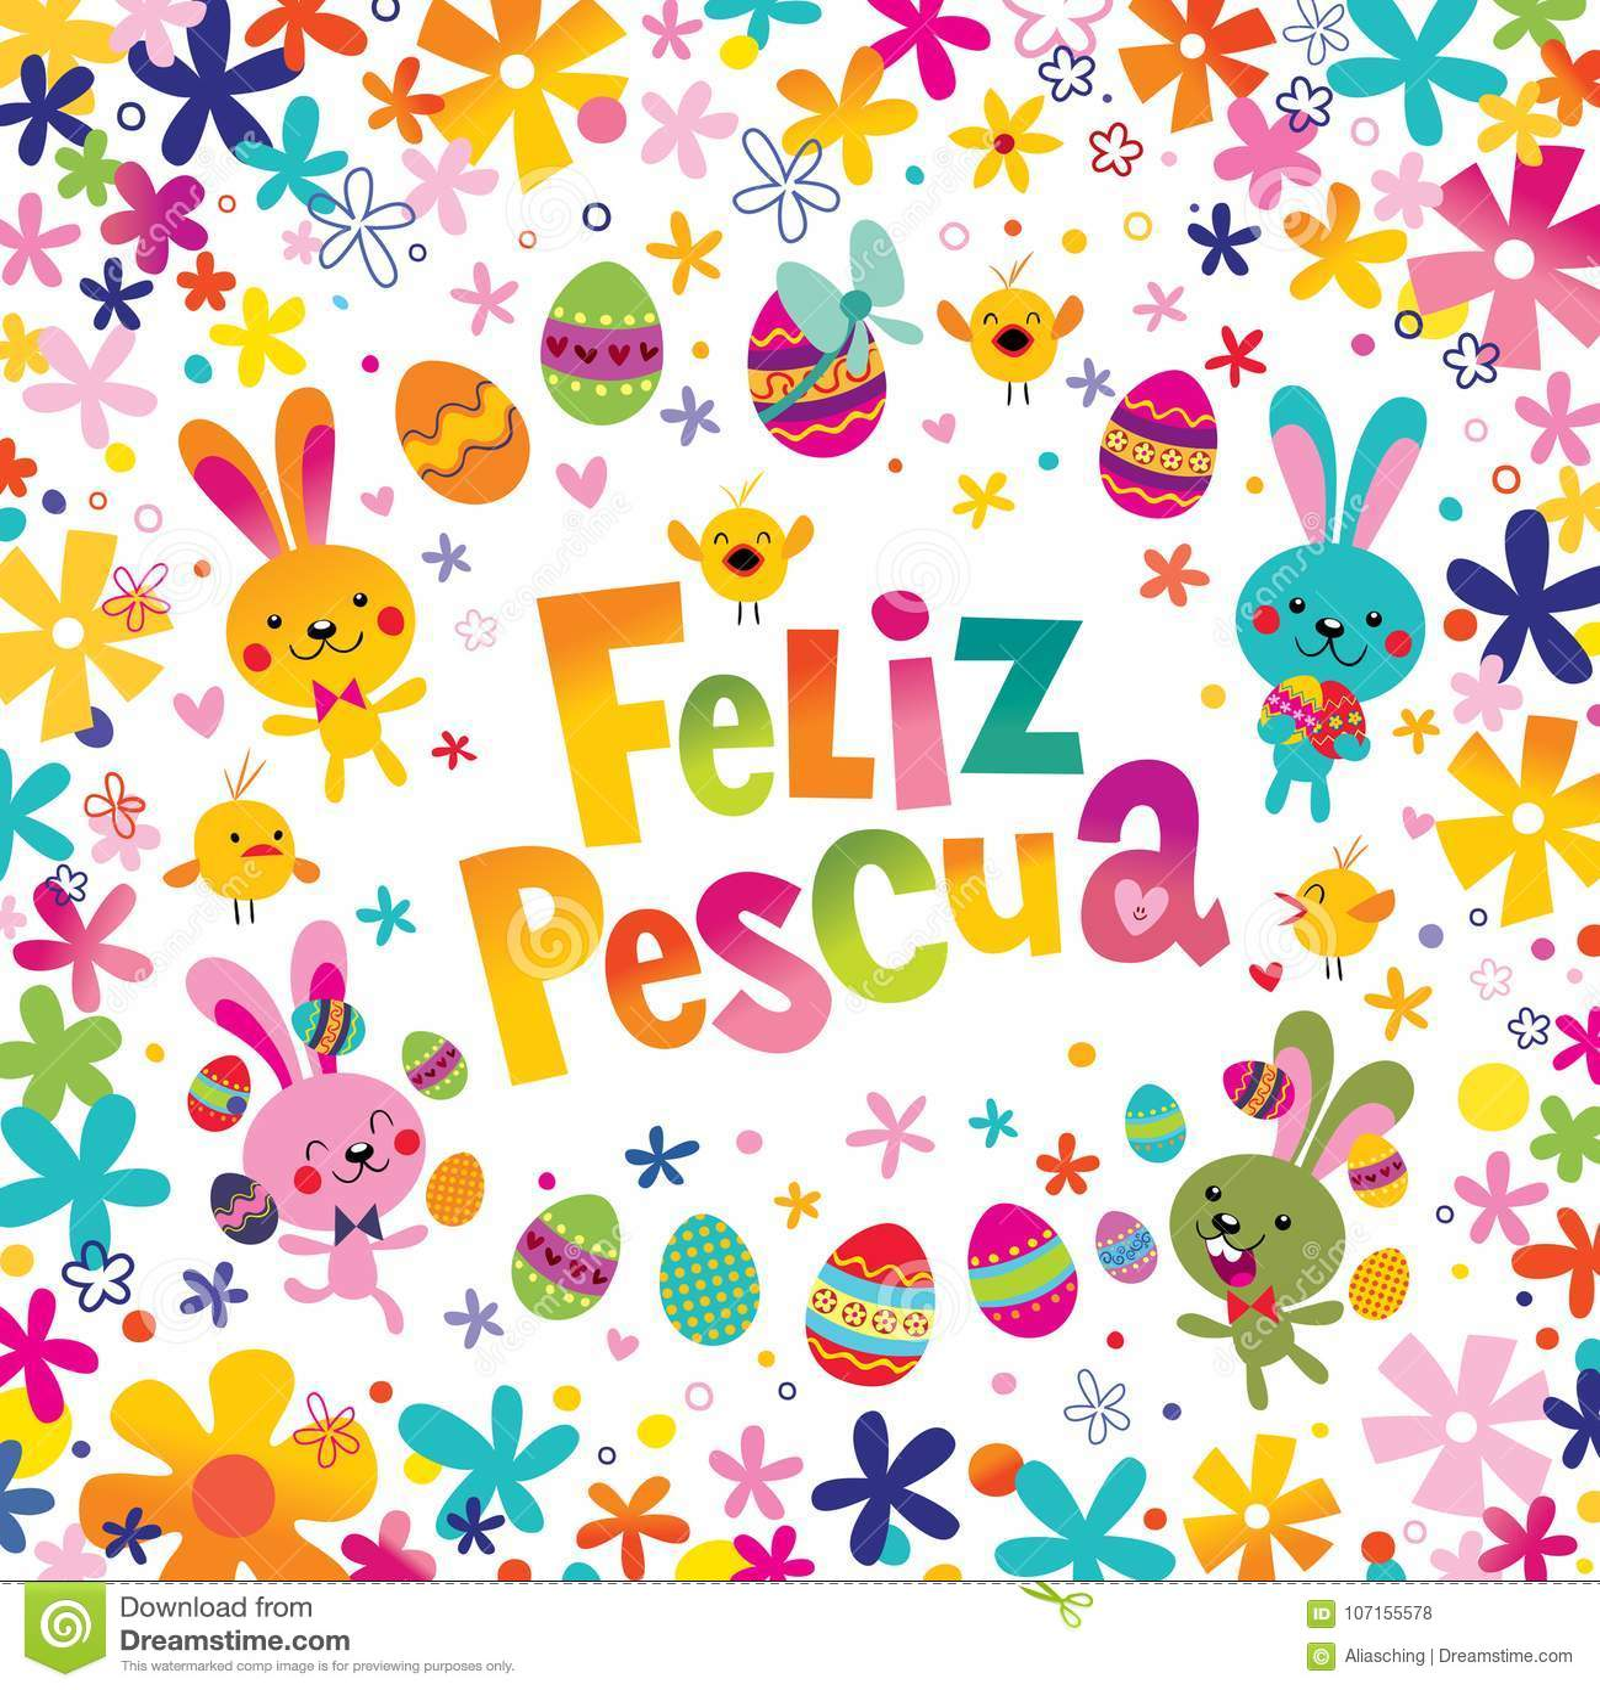 Feliz pascua happy easter in spanish greeting card stock vector download feliz pascua happy easter in spanish greeting card stock vector illustration of type m4hsunfo